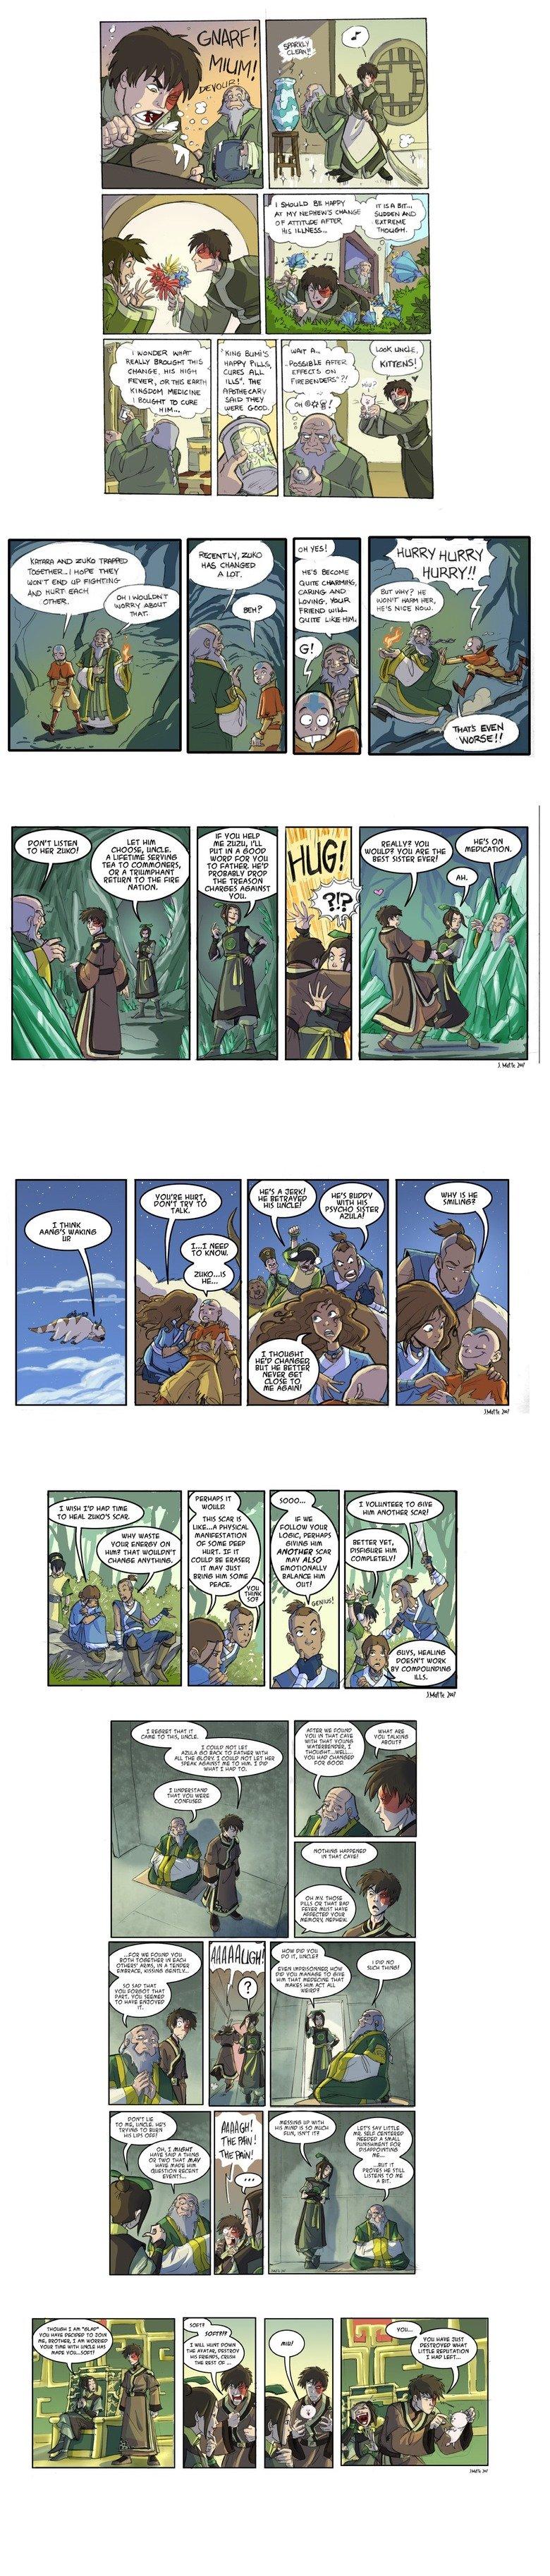 Avatar Comic Comp. Comics based on the season 2 finale .. poor zuko Avatar Comic Comp Comics based on the season 2 finale poor zuko